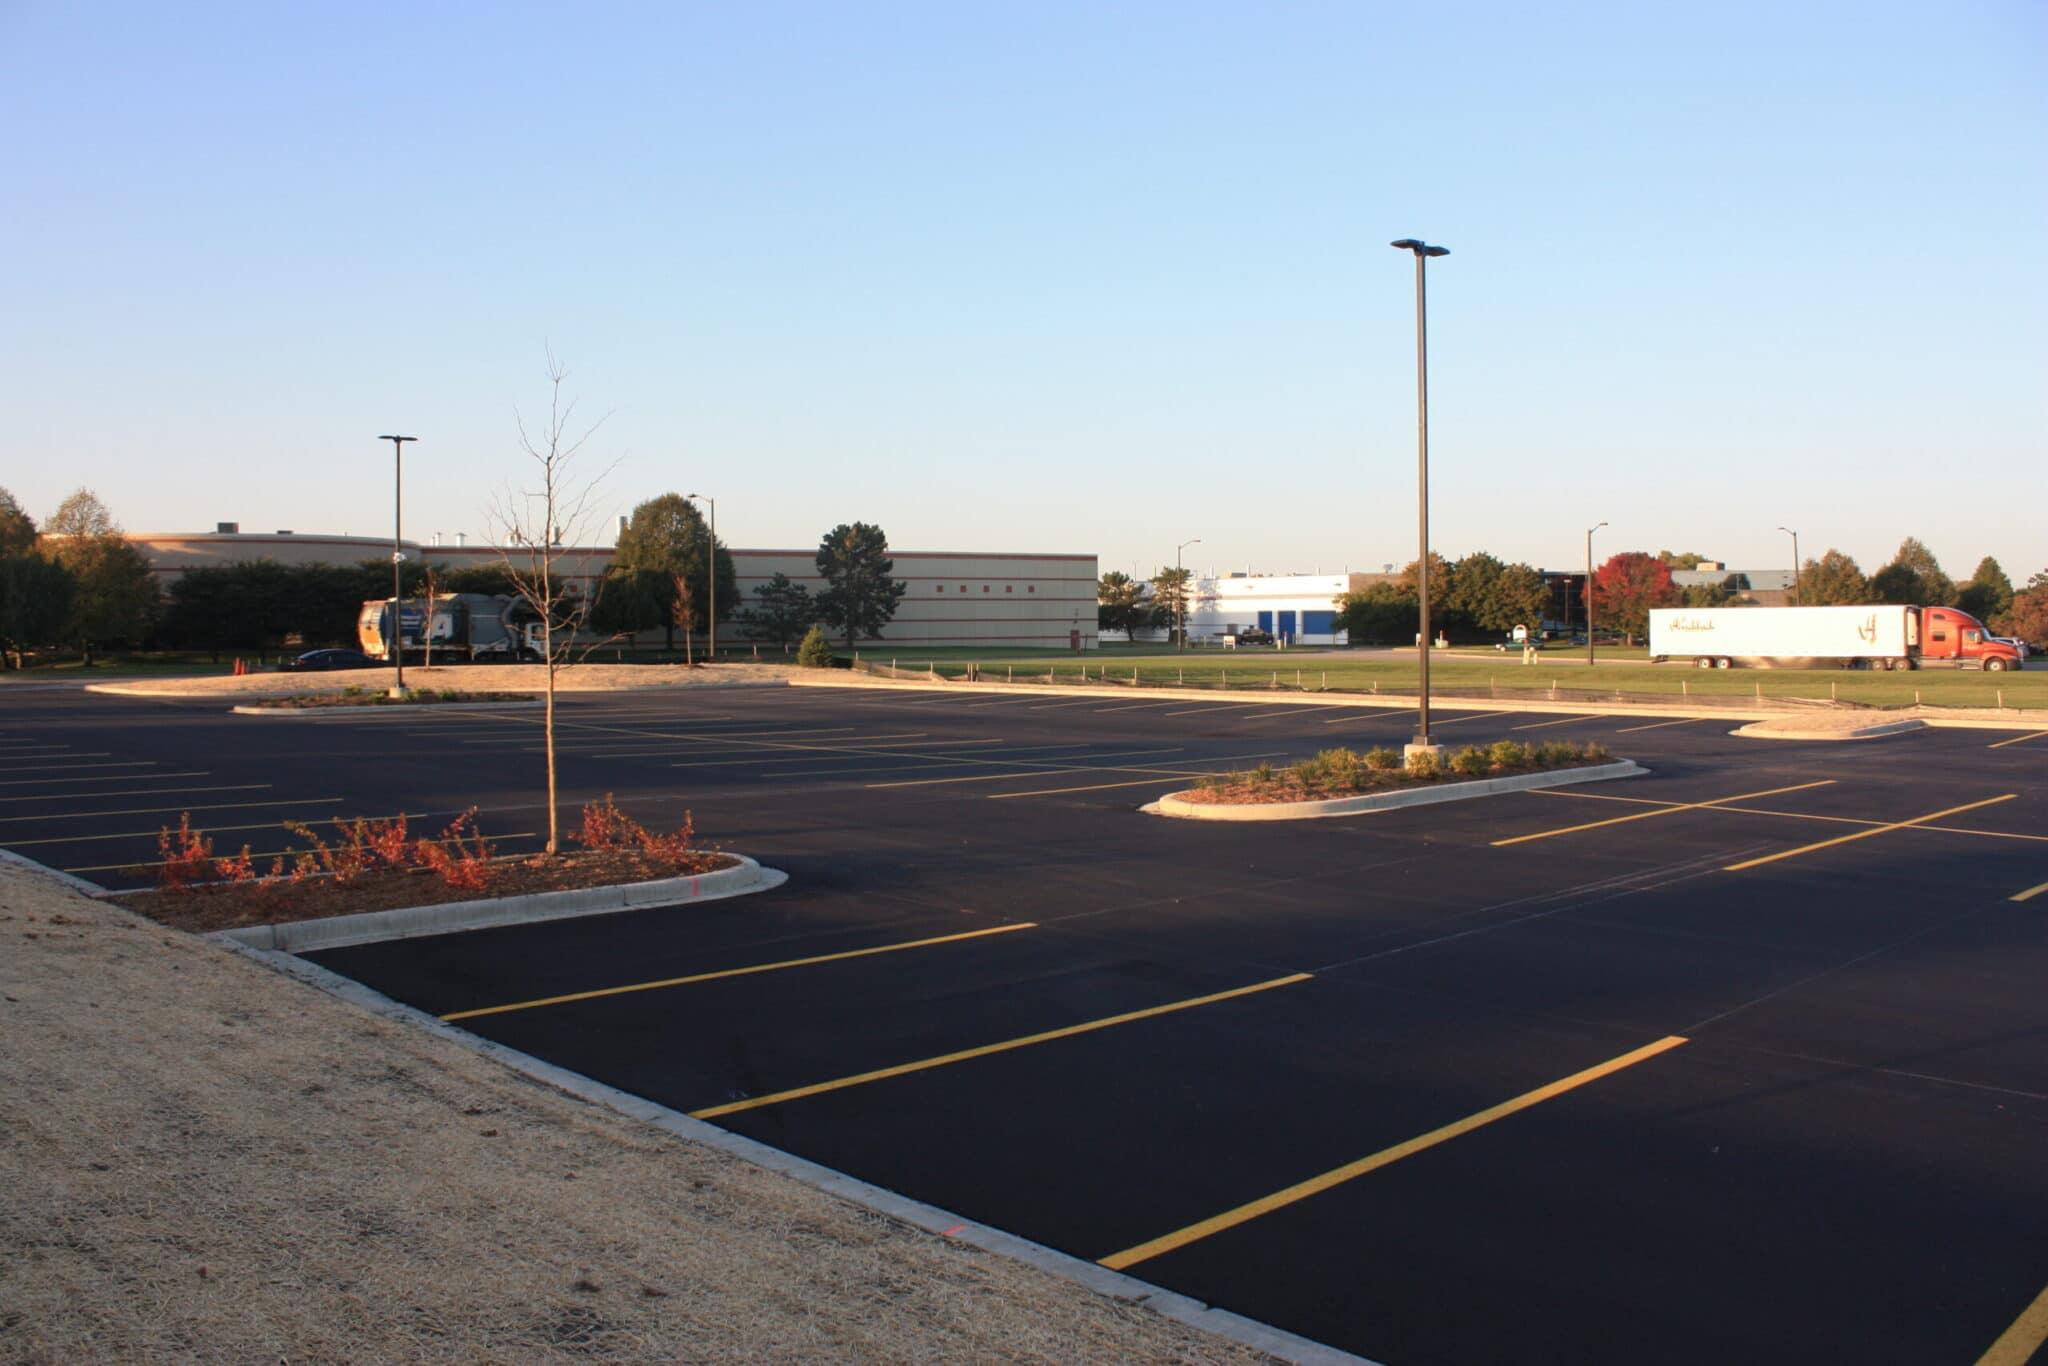 Parking Lot Restoration in Kenosha, cicchini asphalt, parking lot services